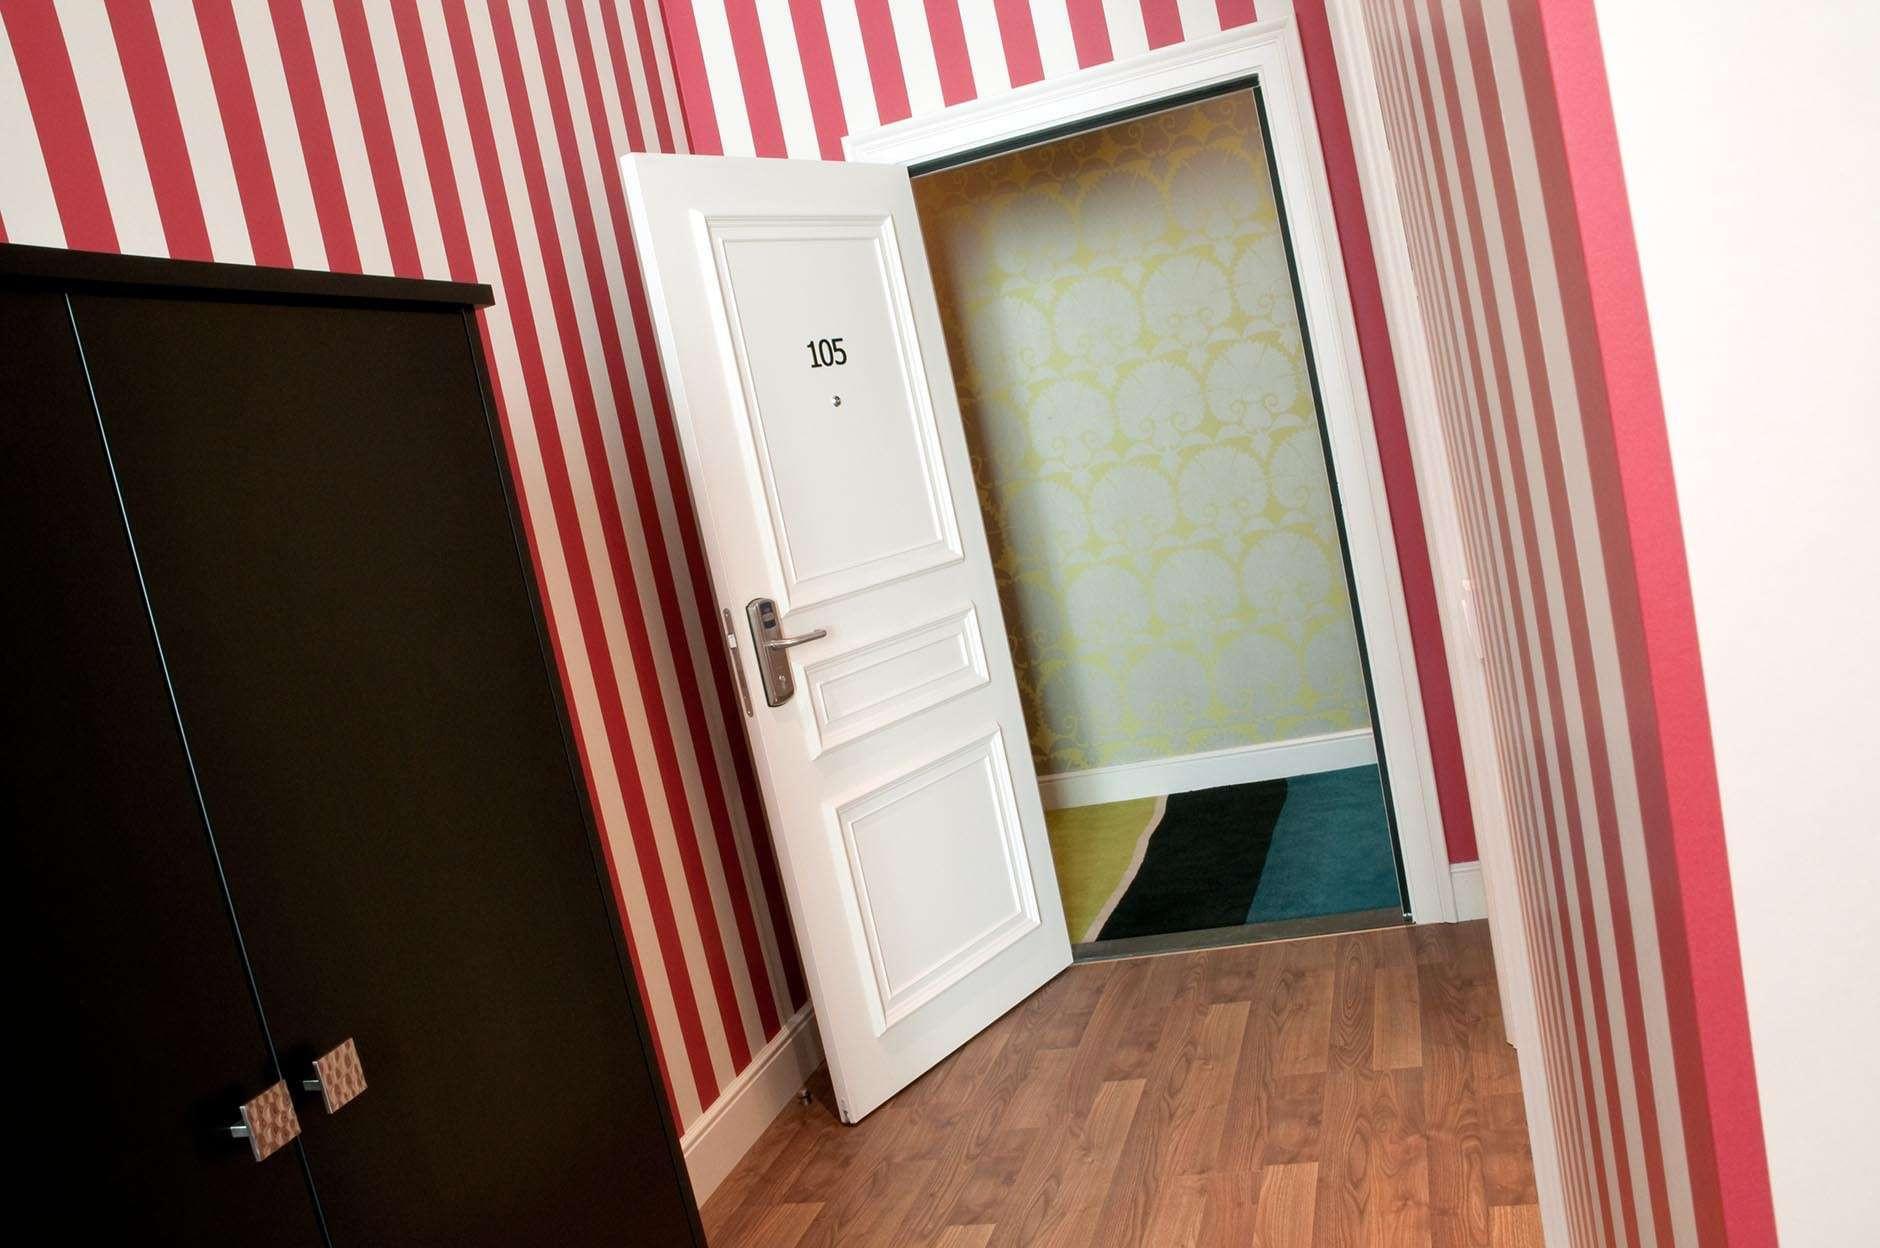 Nordex_Hotel Reylof_13